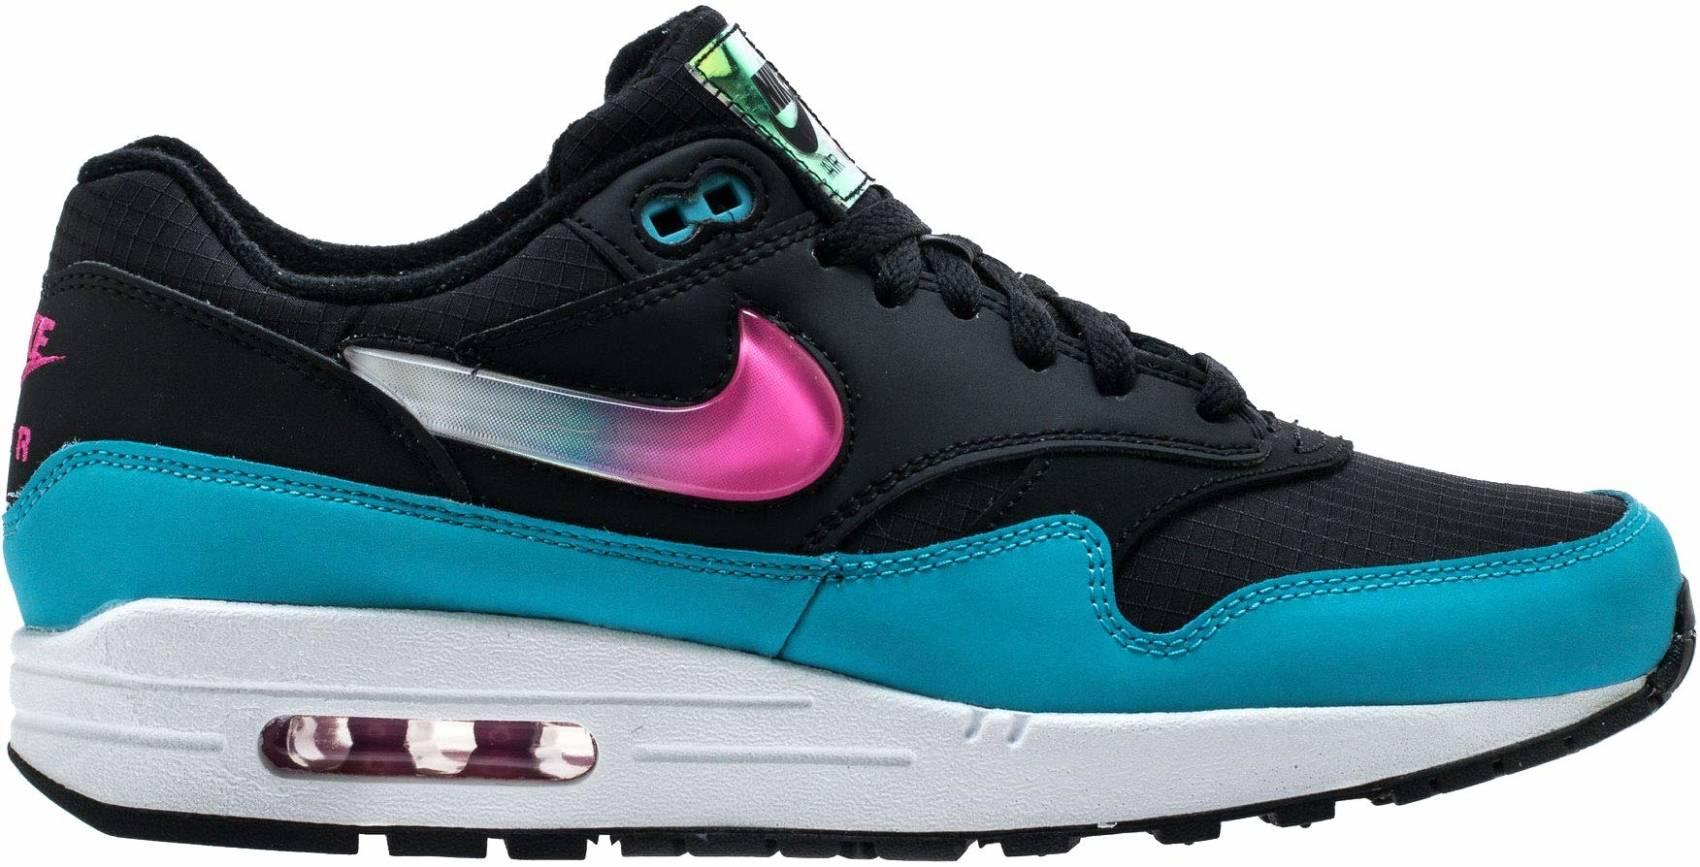 Nike Air Max 1 sneakers in 3 colors (only $105)   RunRepeat